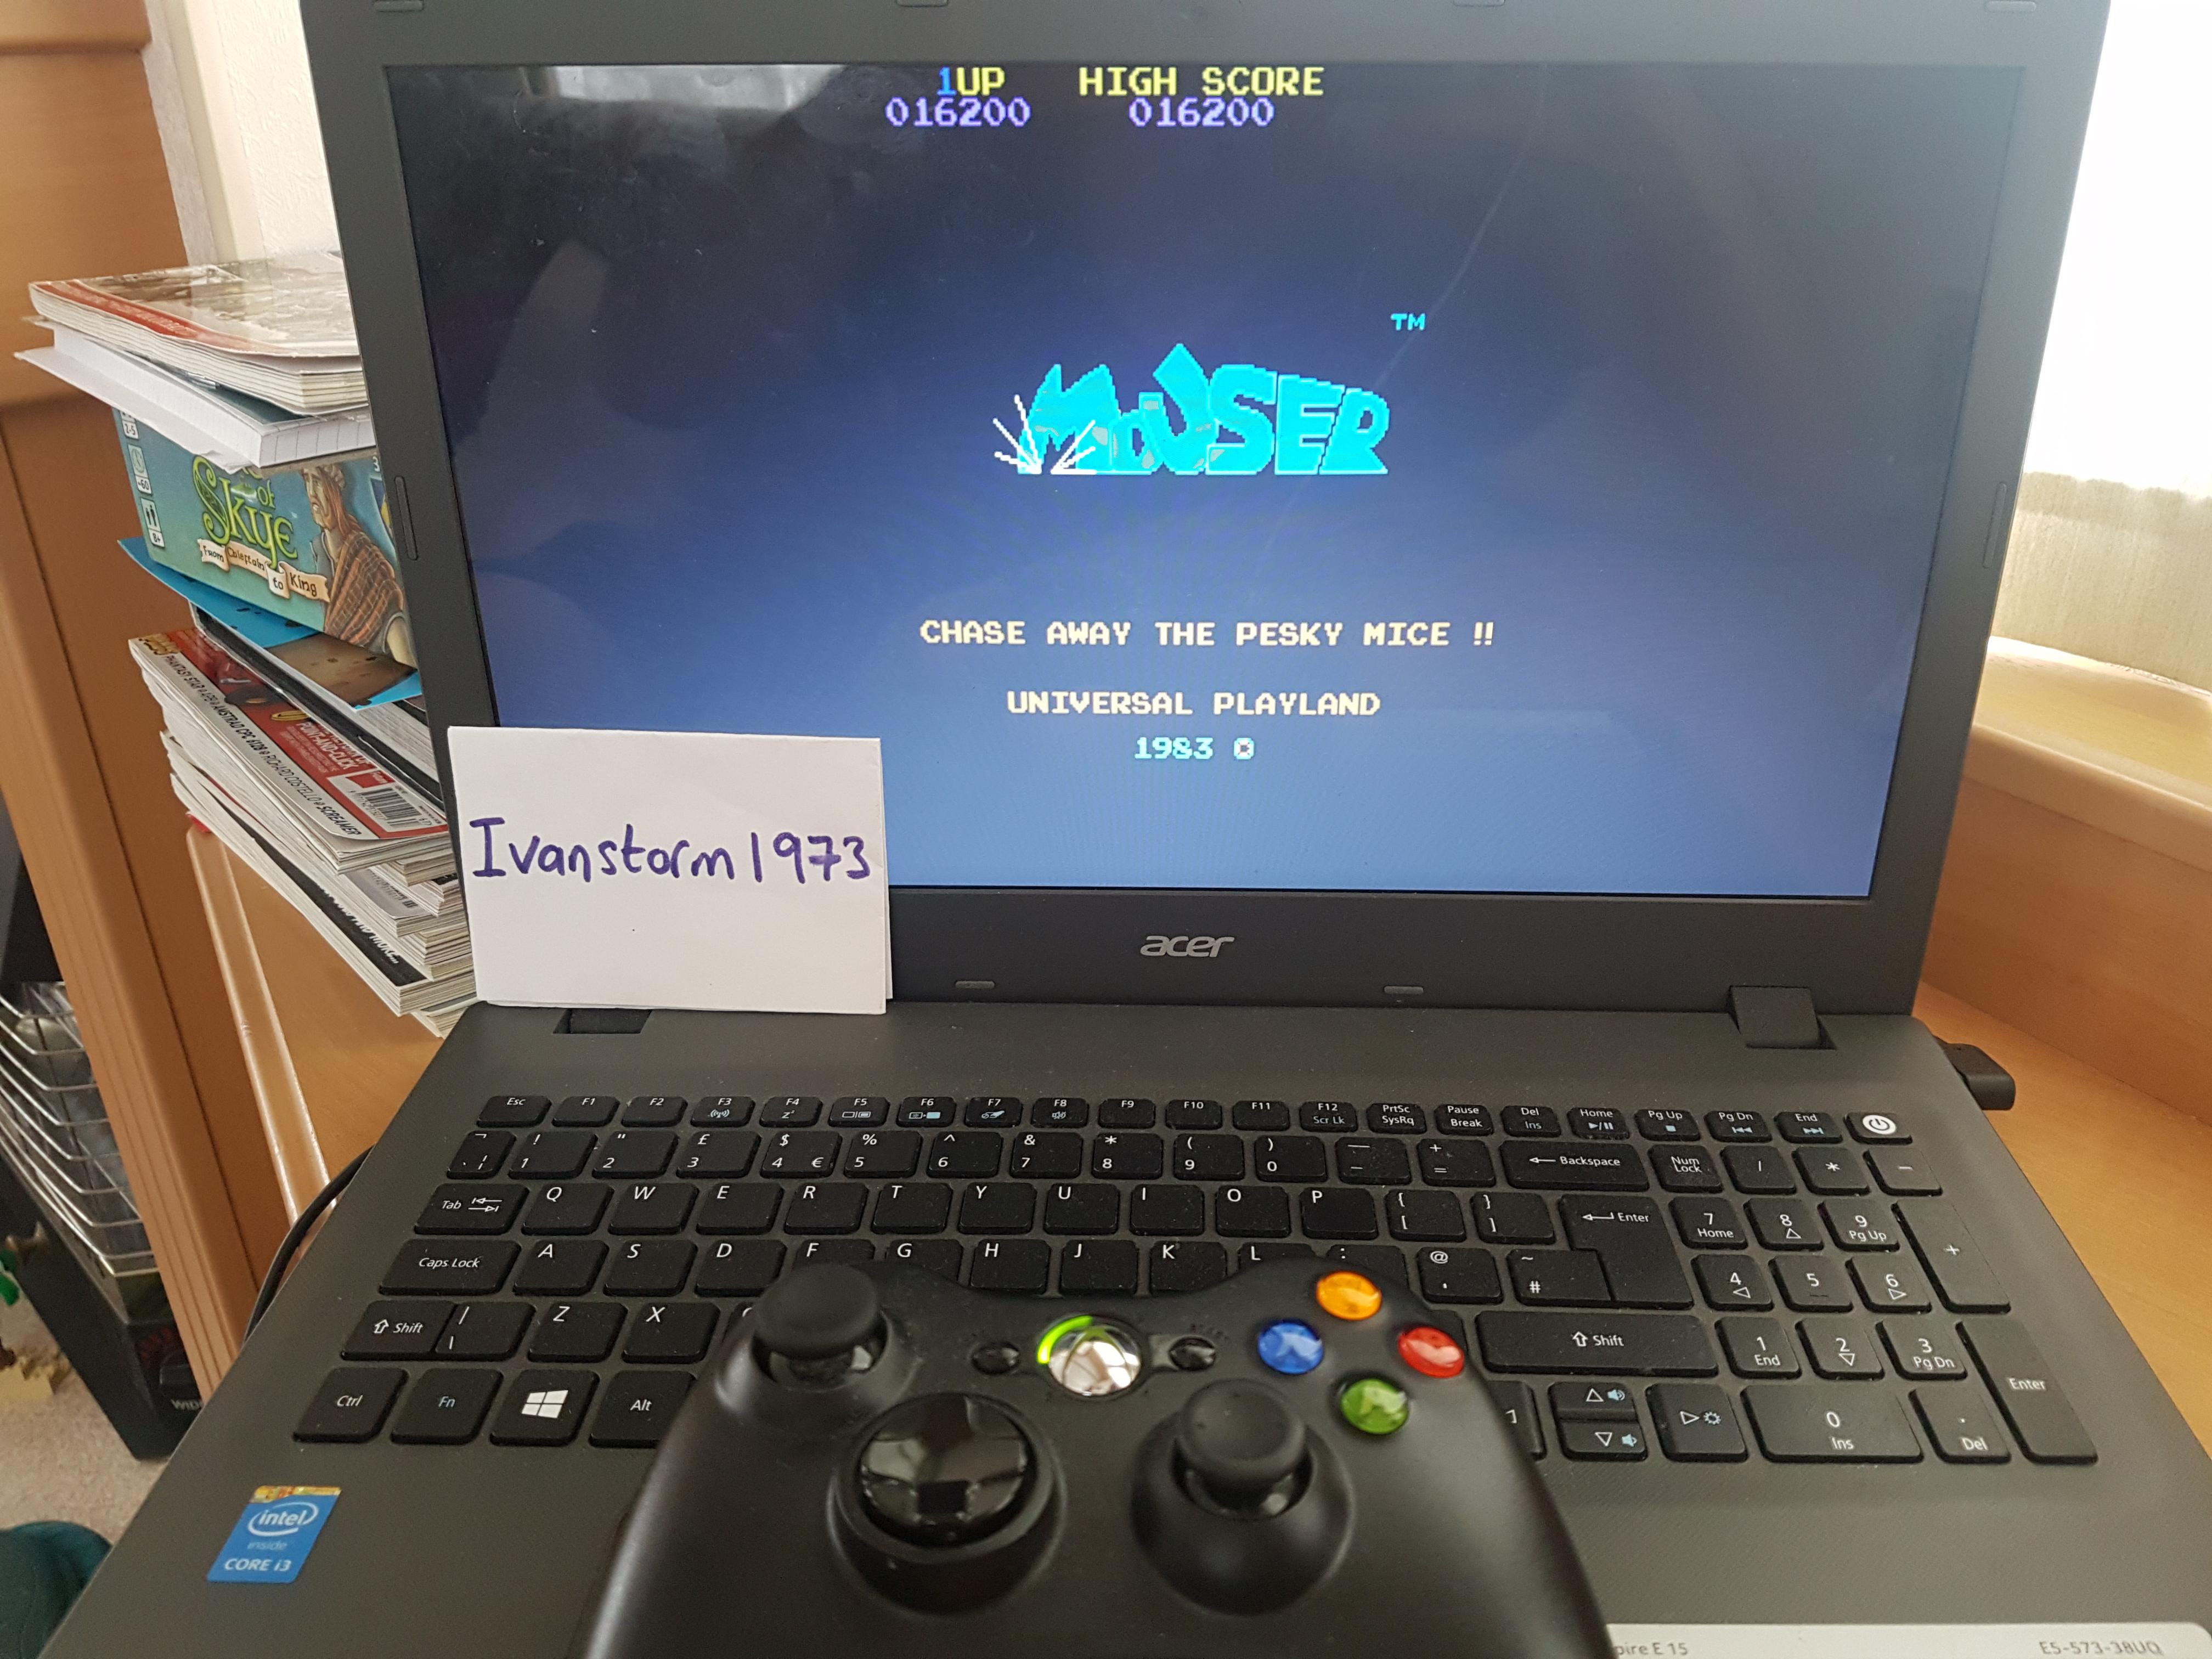 Ivanstorm1973: Mouser [mouser] (Arcade Emulated / M.A.M.E.) 16,200 points on 2017-07-25 05:14:49